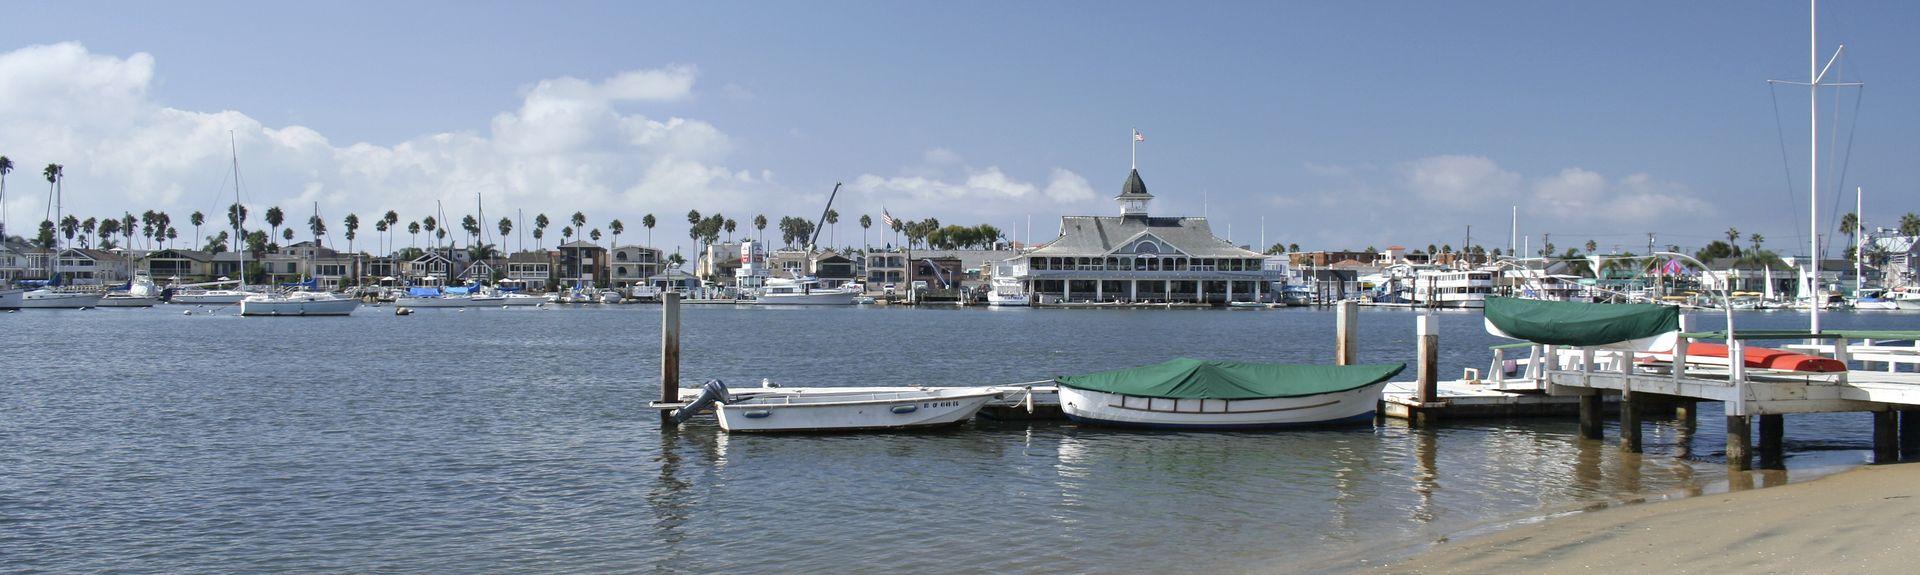 Balboa Island, Newport Beach, Kalifornien, Vereinigte Staaten